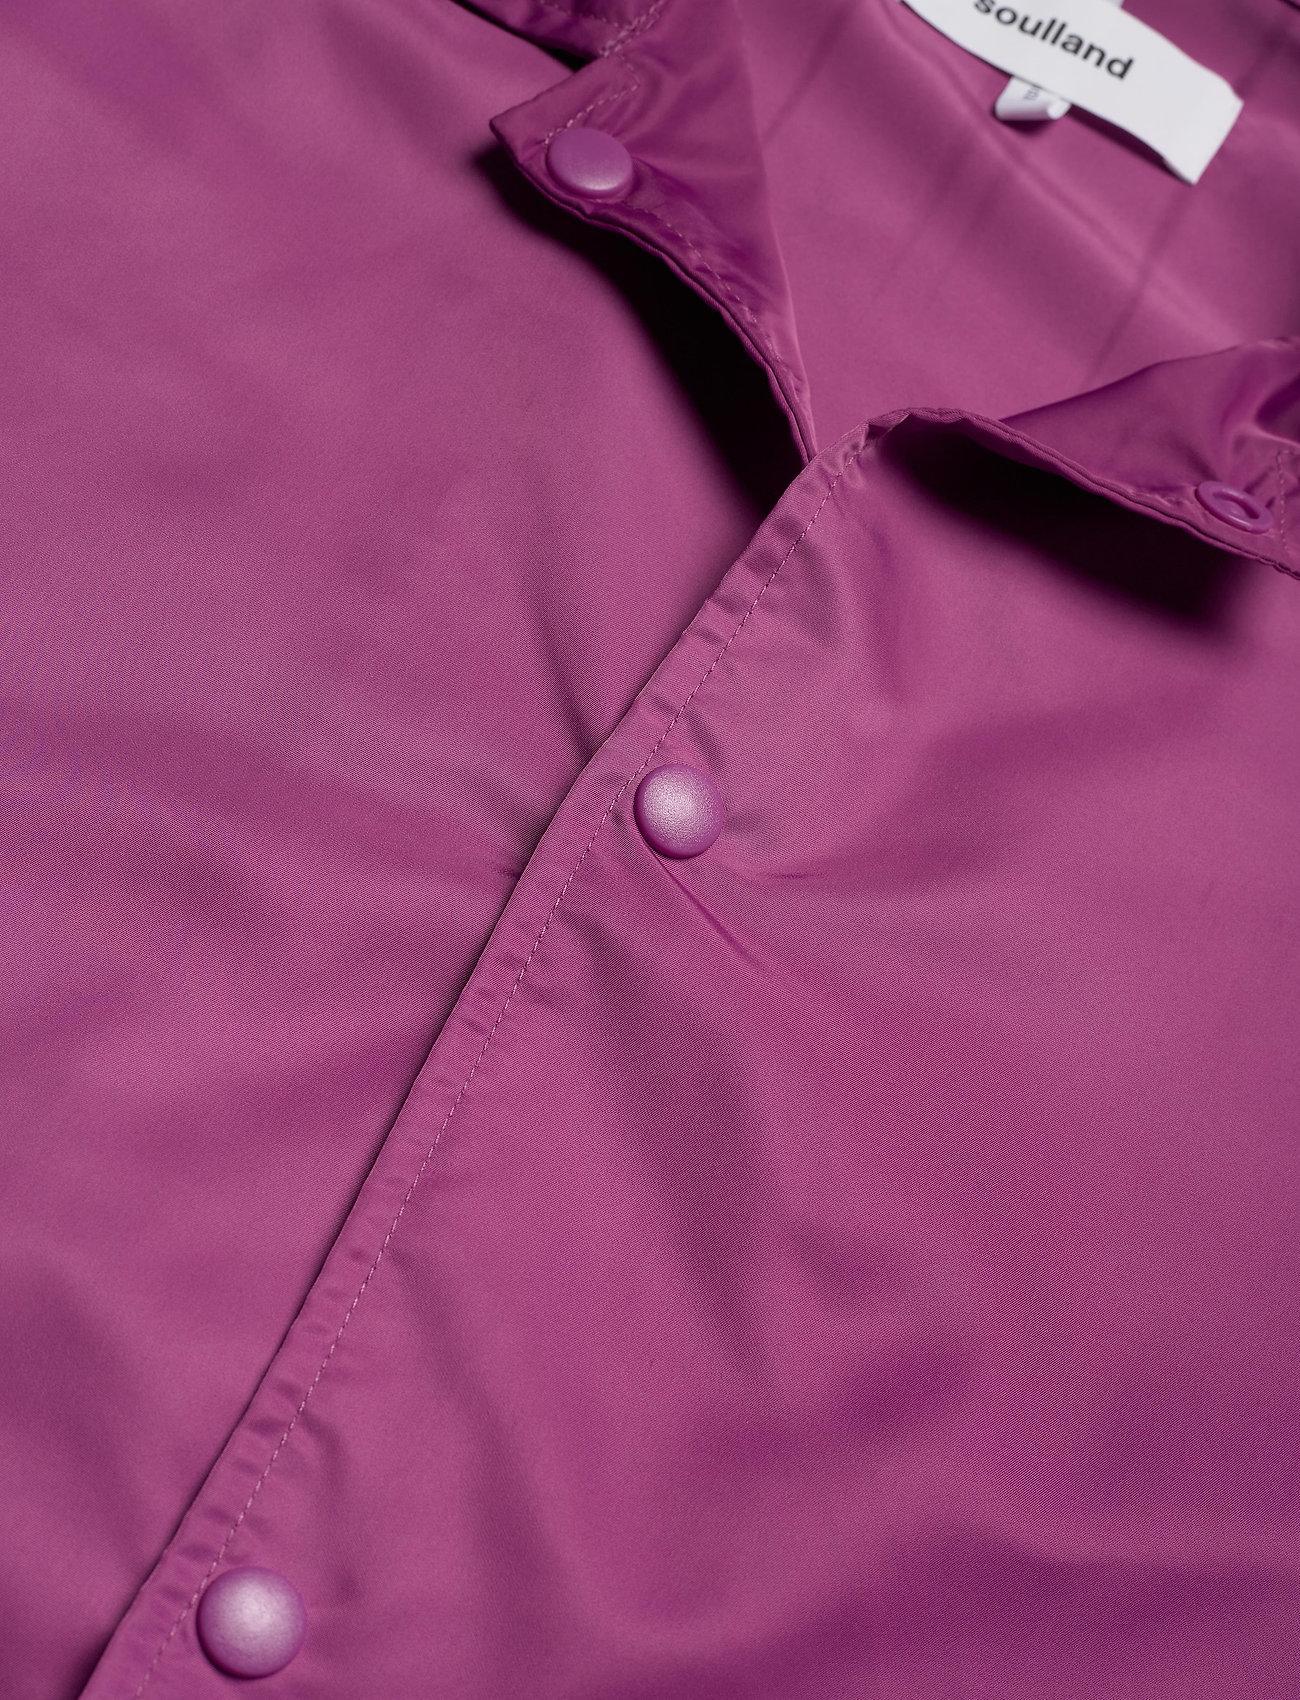 Soulland - Strugat jacket - bomberjackor - purple - 1